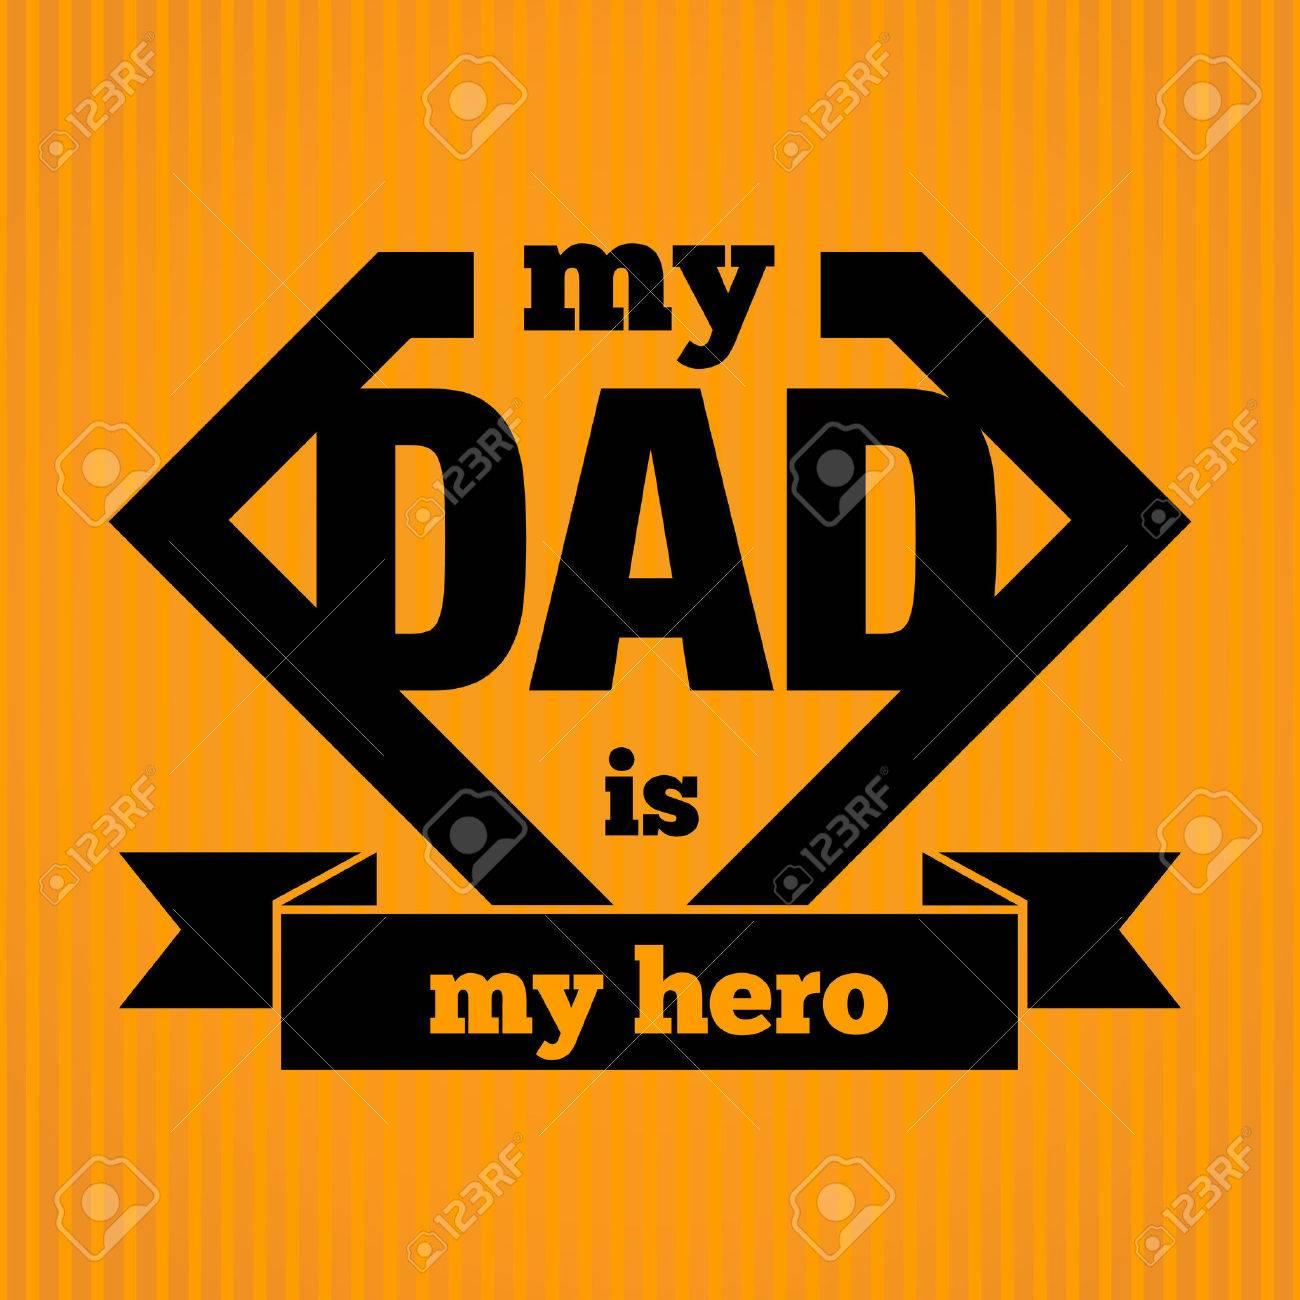 My Dad Is My Hero Symbol Vector Illustration Royalty Free Cliparts